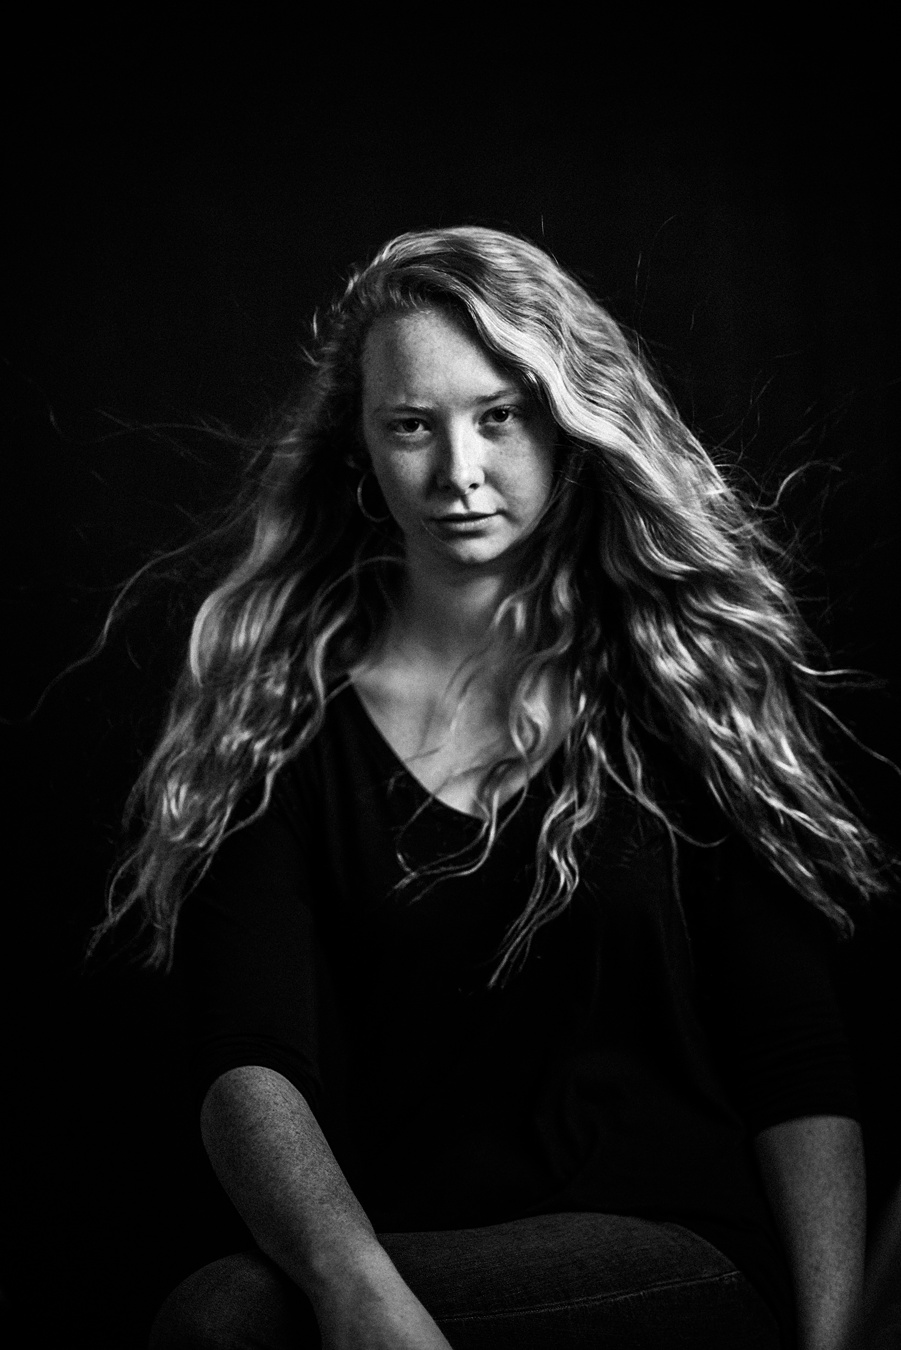 bare-beauty-nomakeup-portraits-tessa-marie-studios_0008.jpg